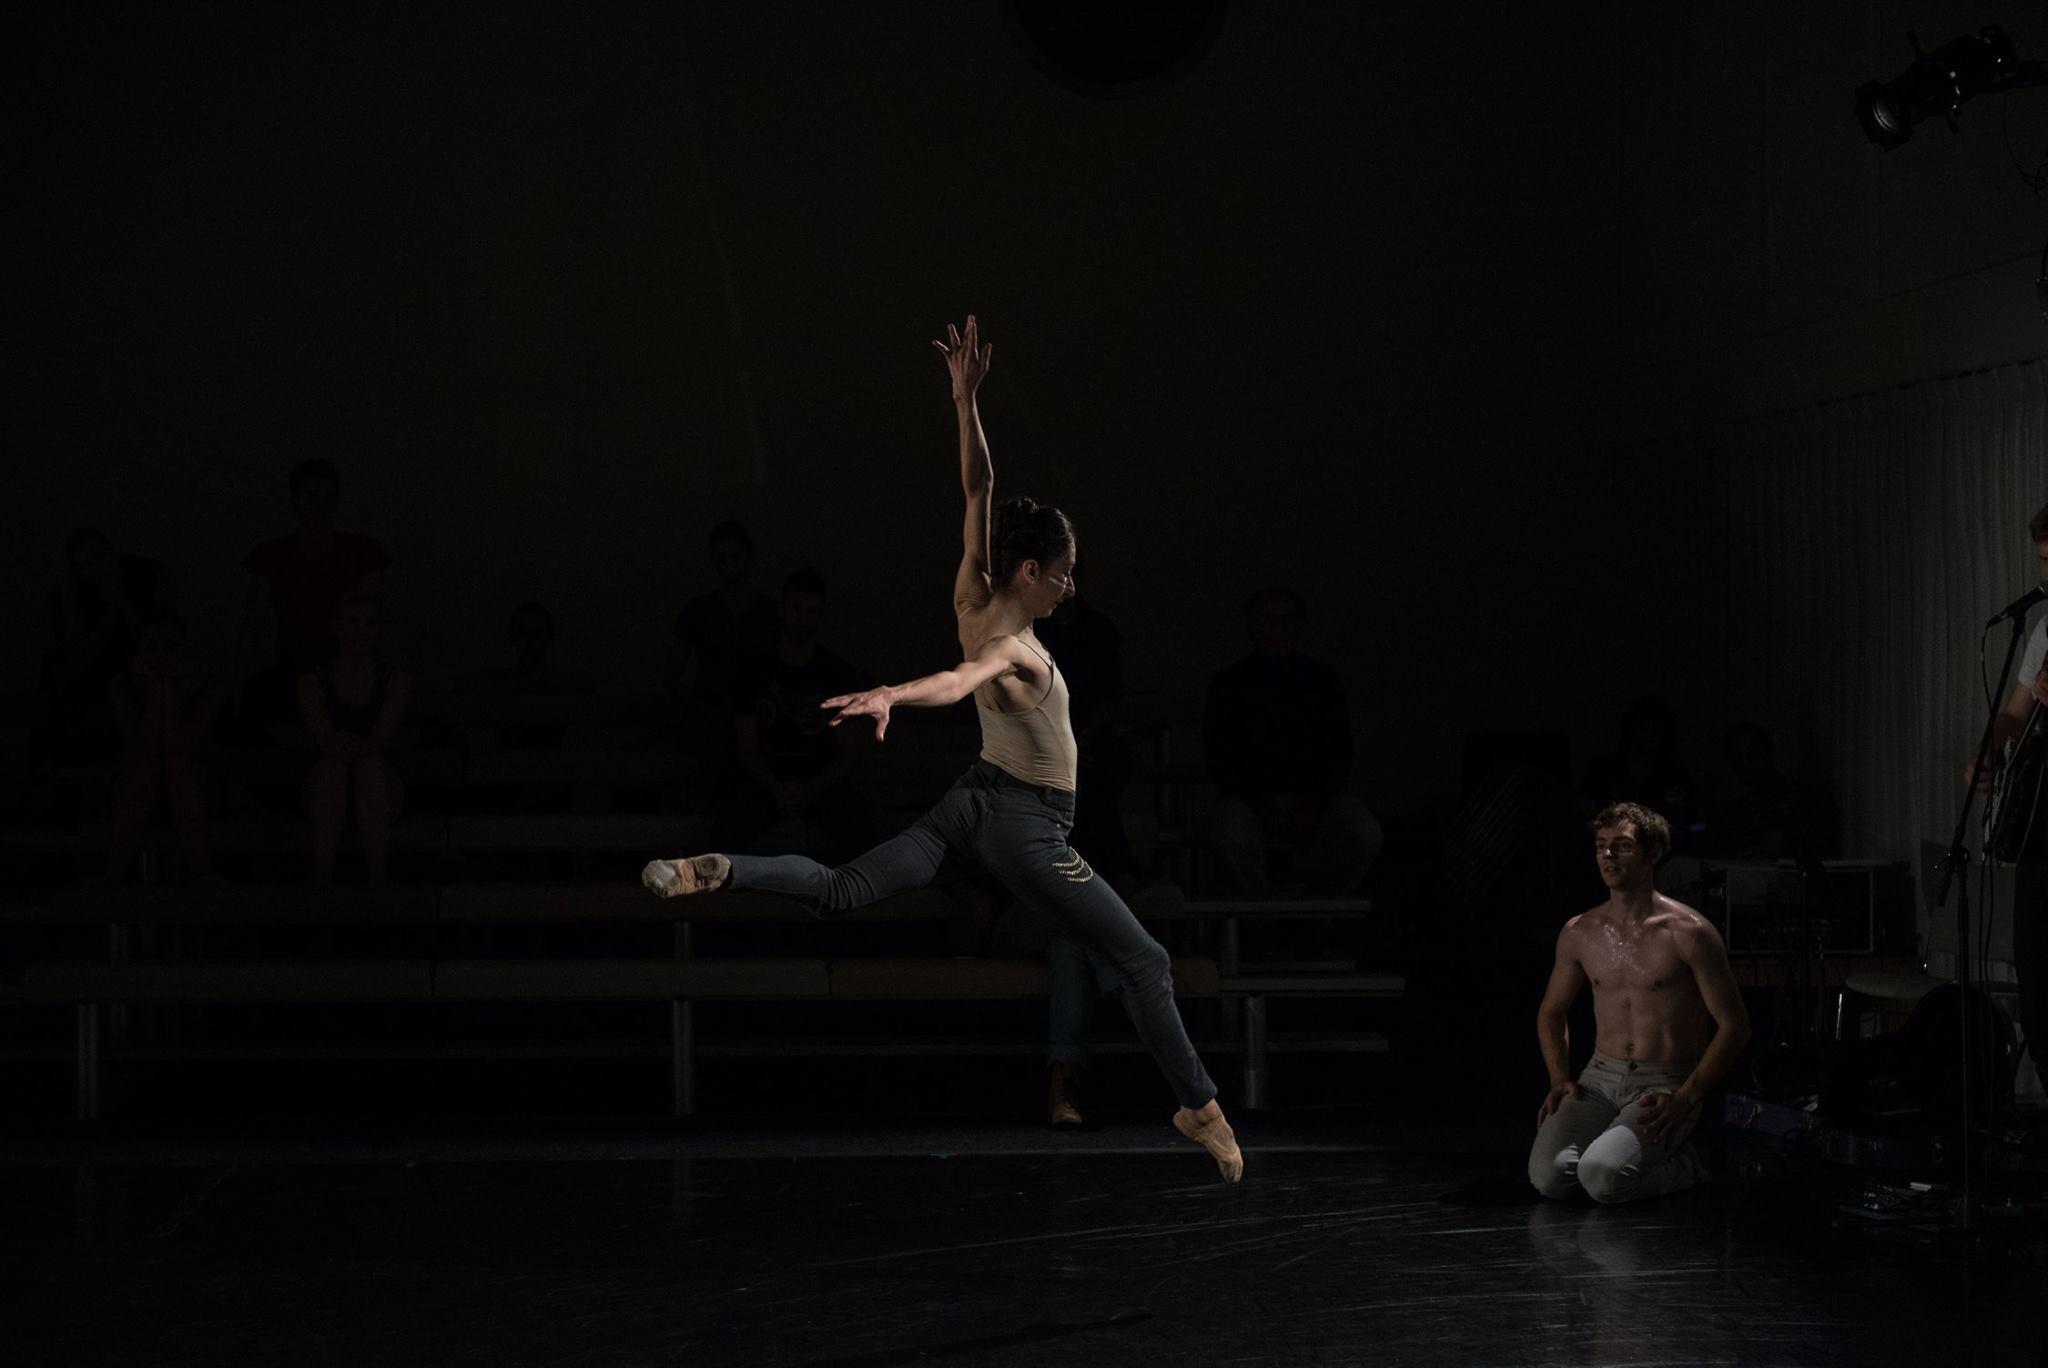 Identity As Fluid As Dance